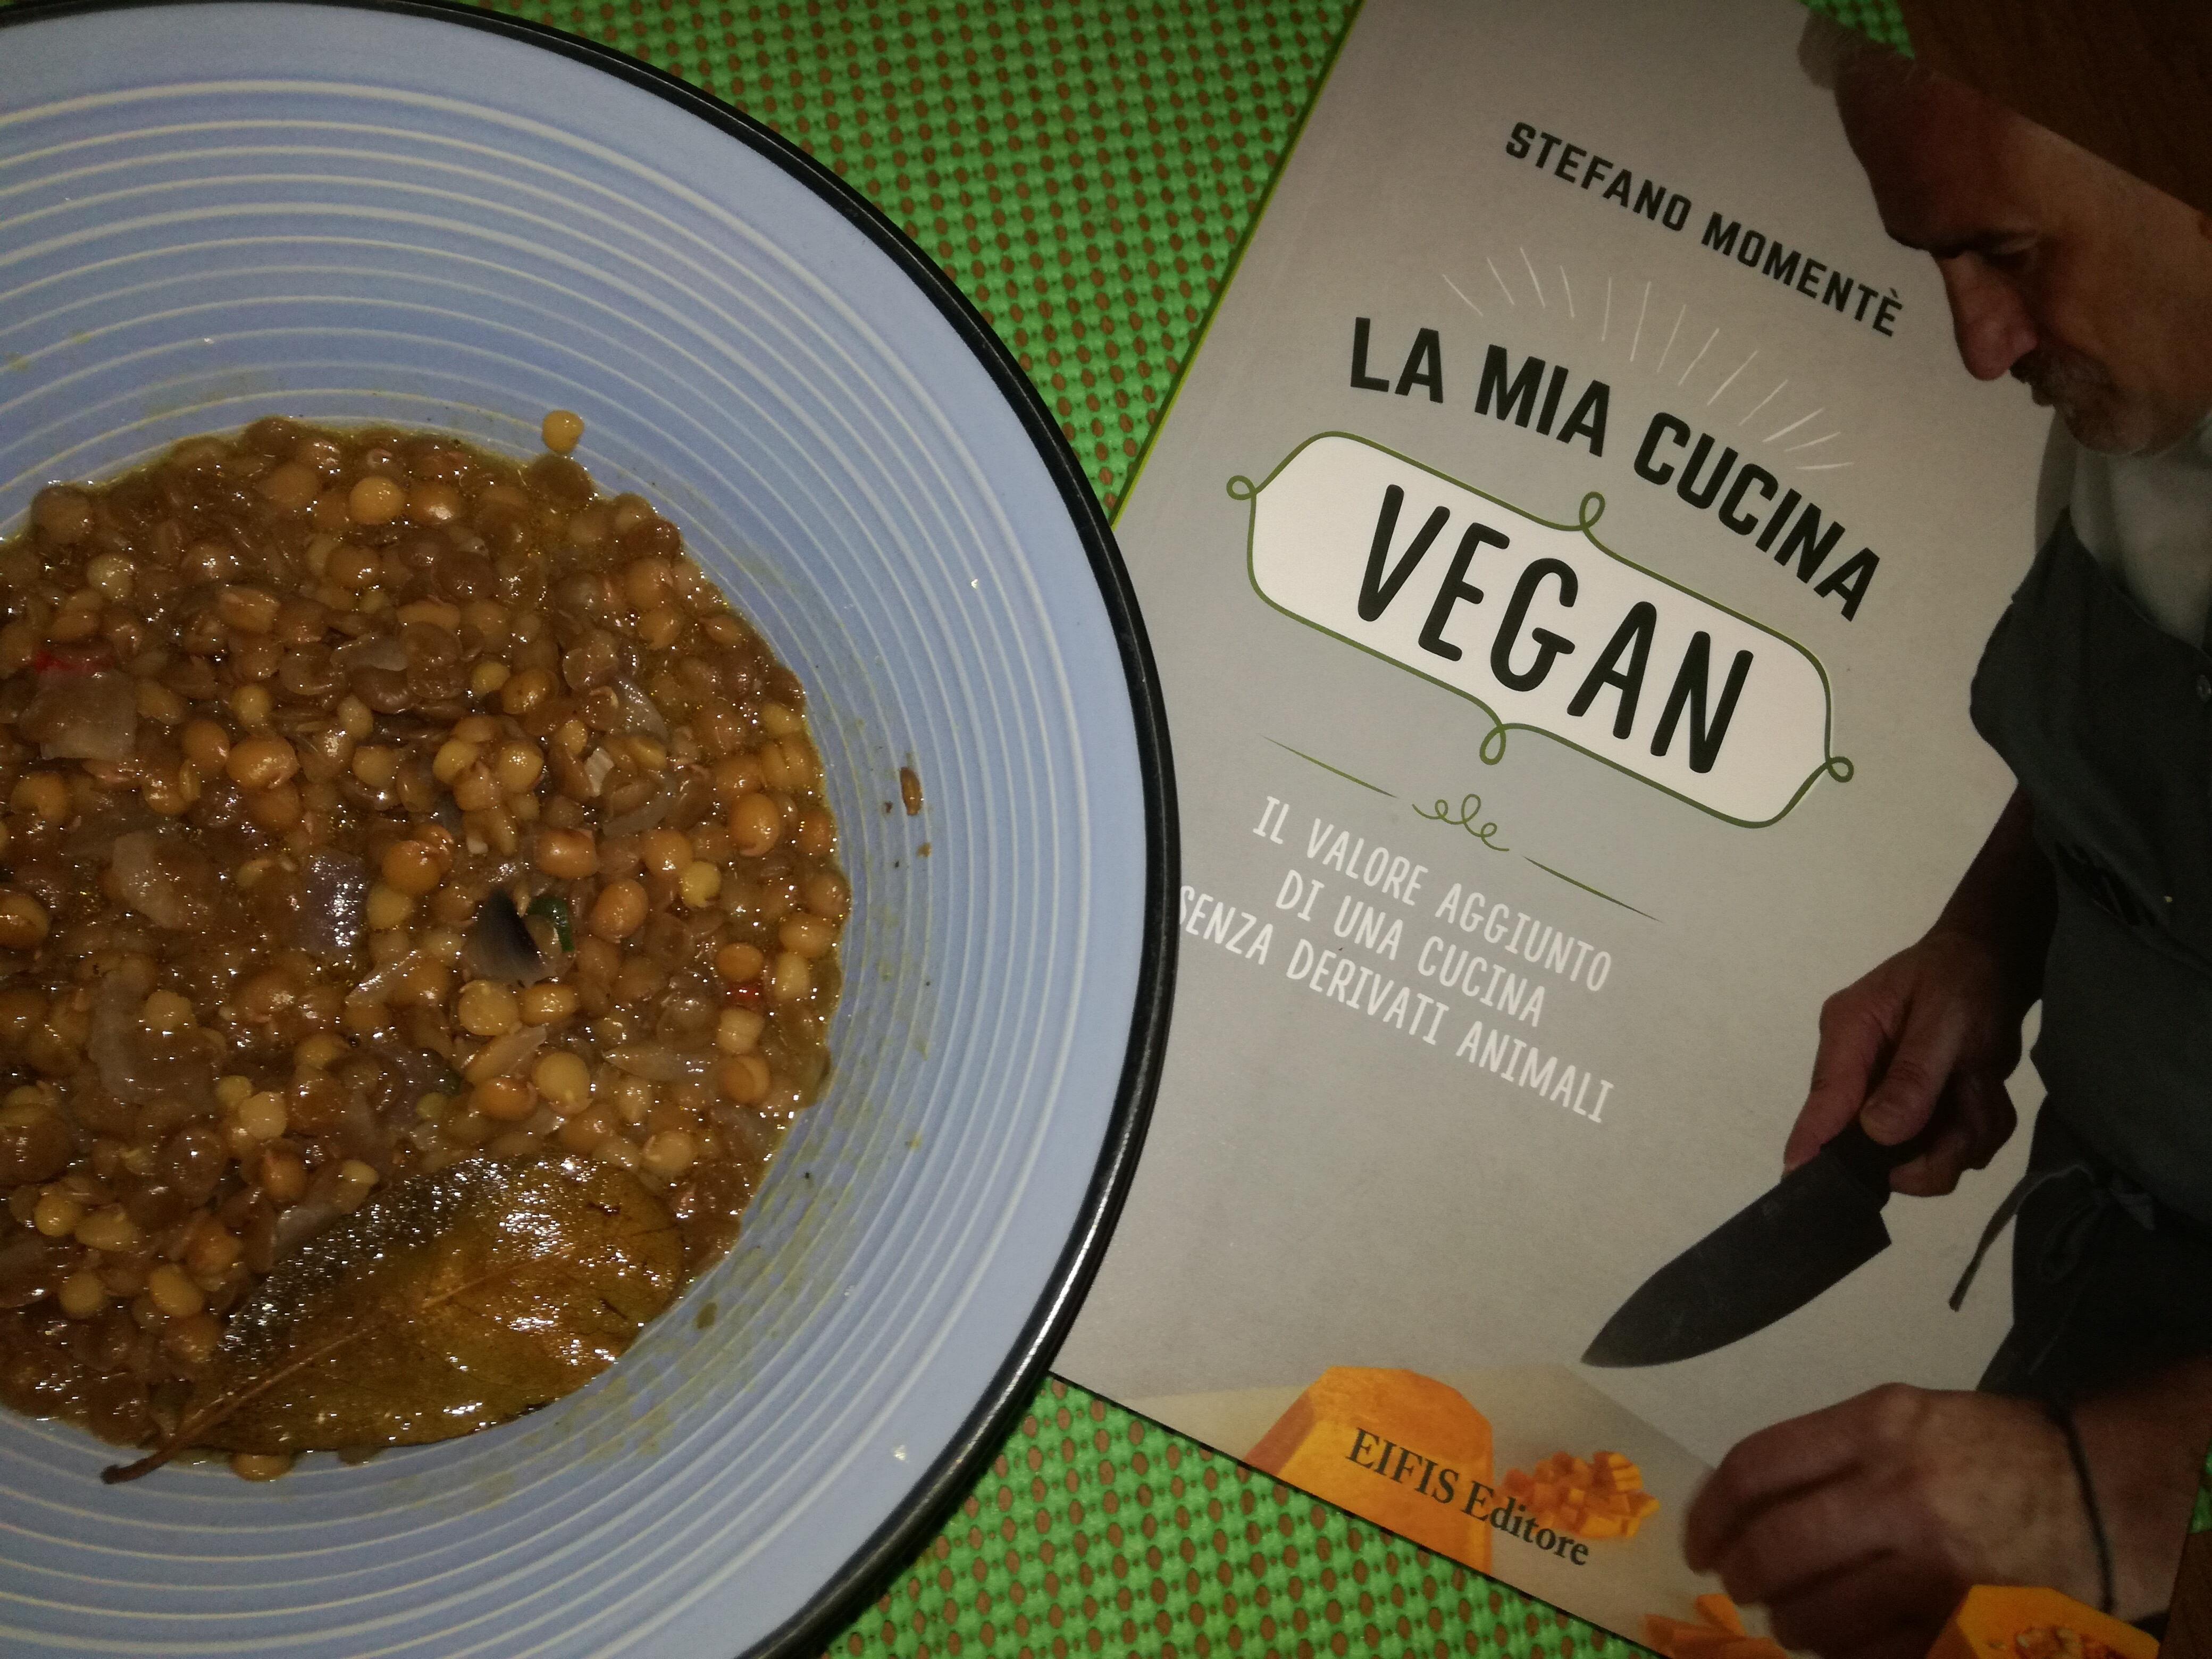 la-mia-cucina-vegan